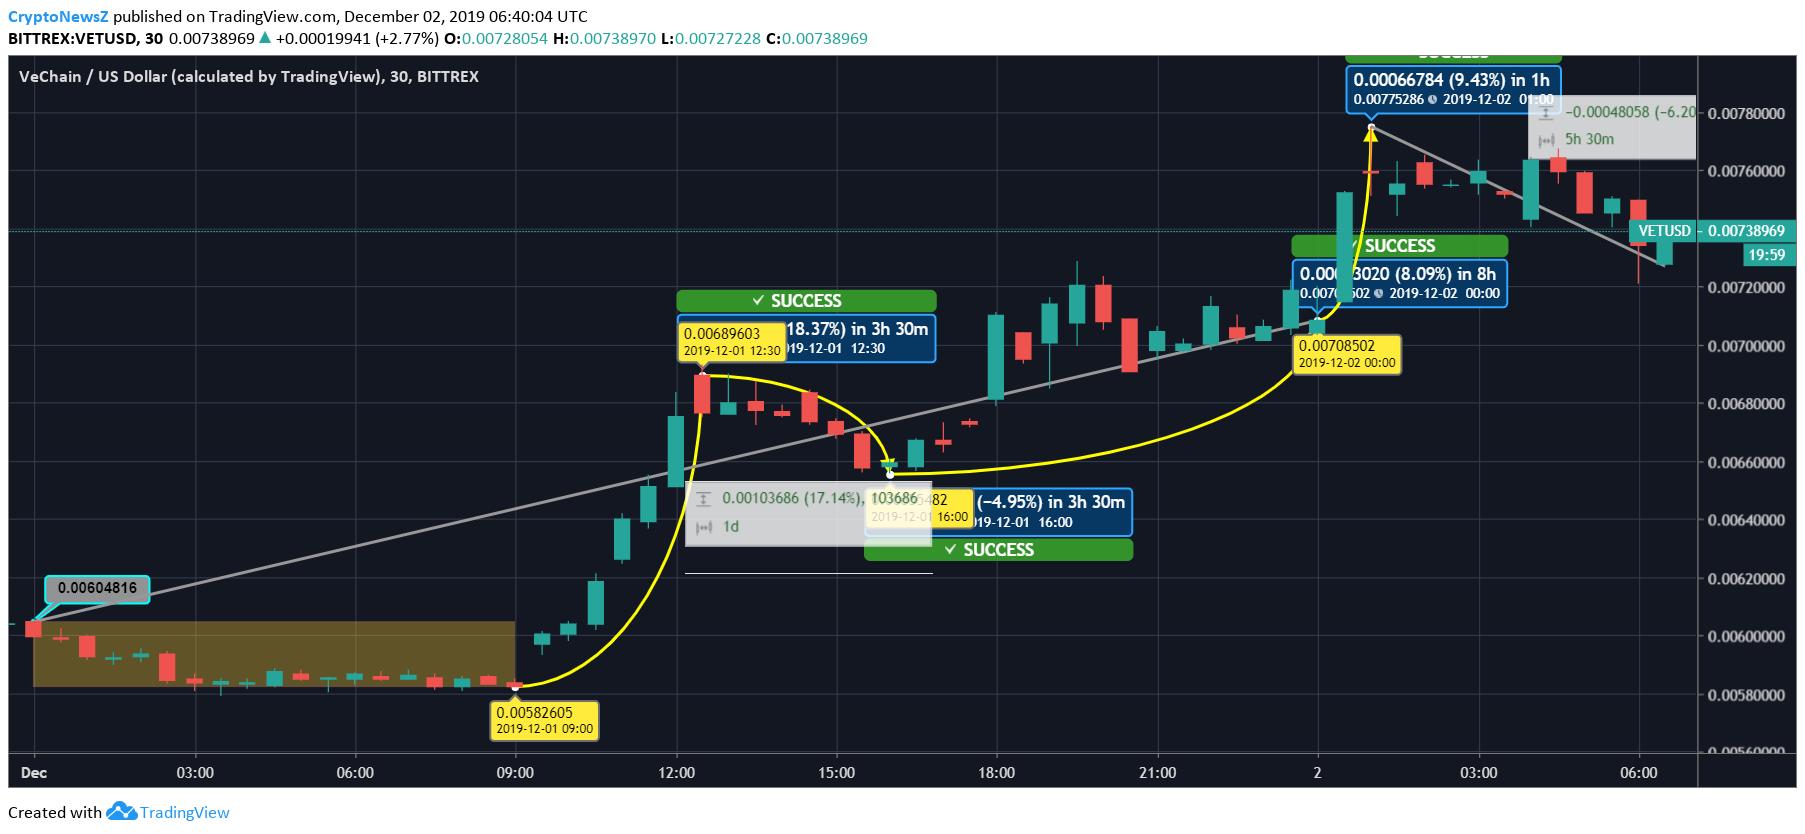 Vechain (VET) Price Chart